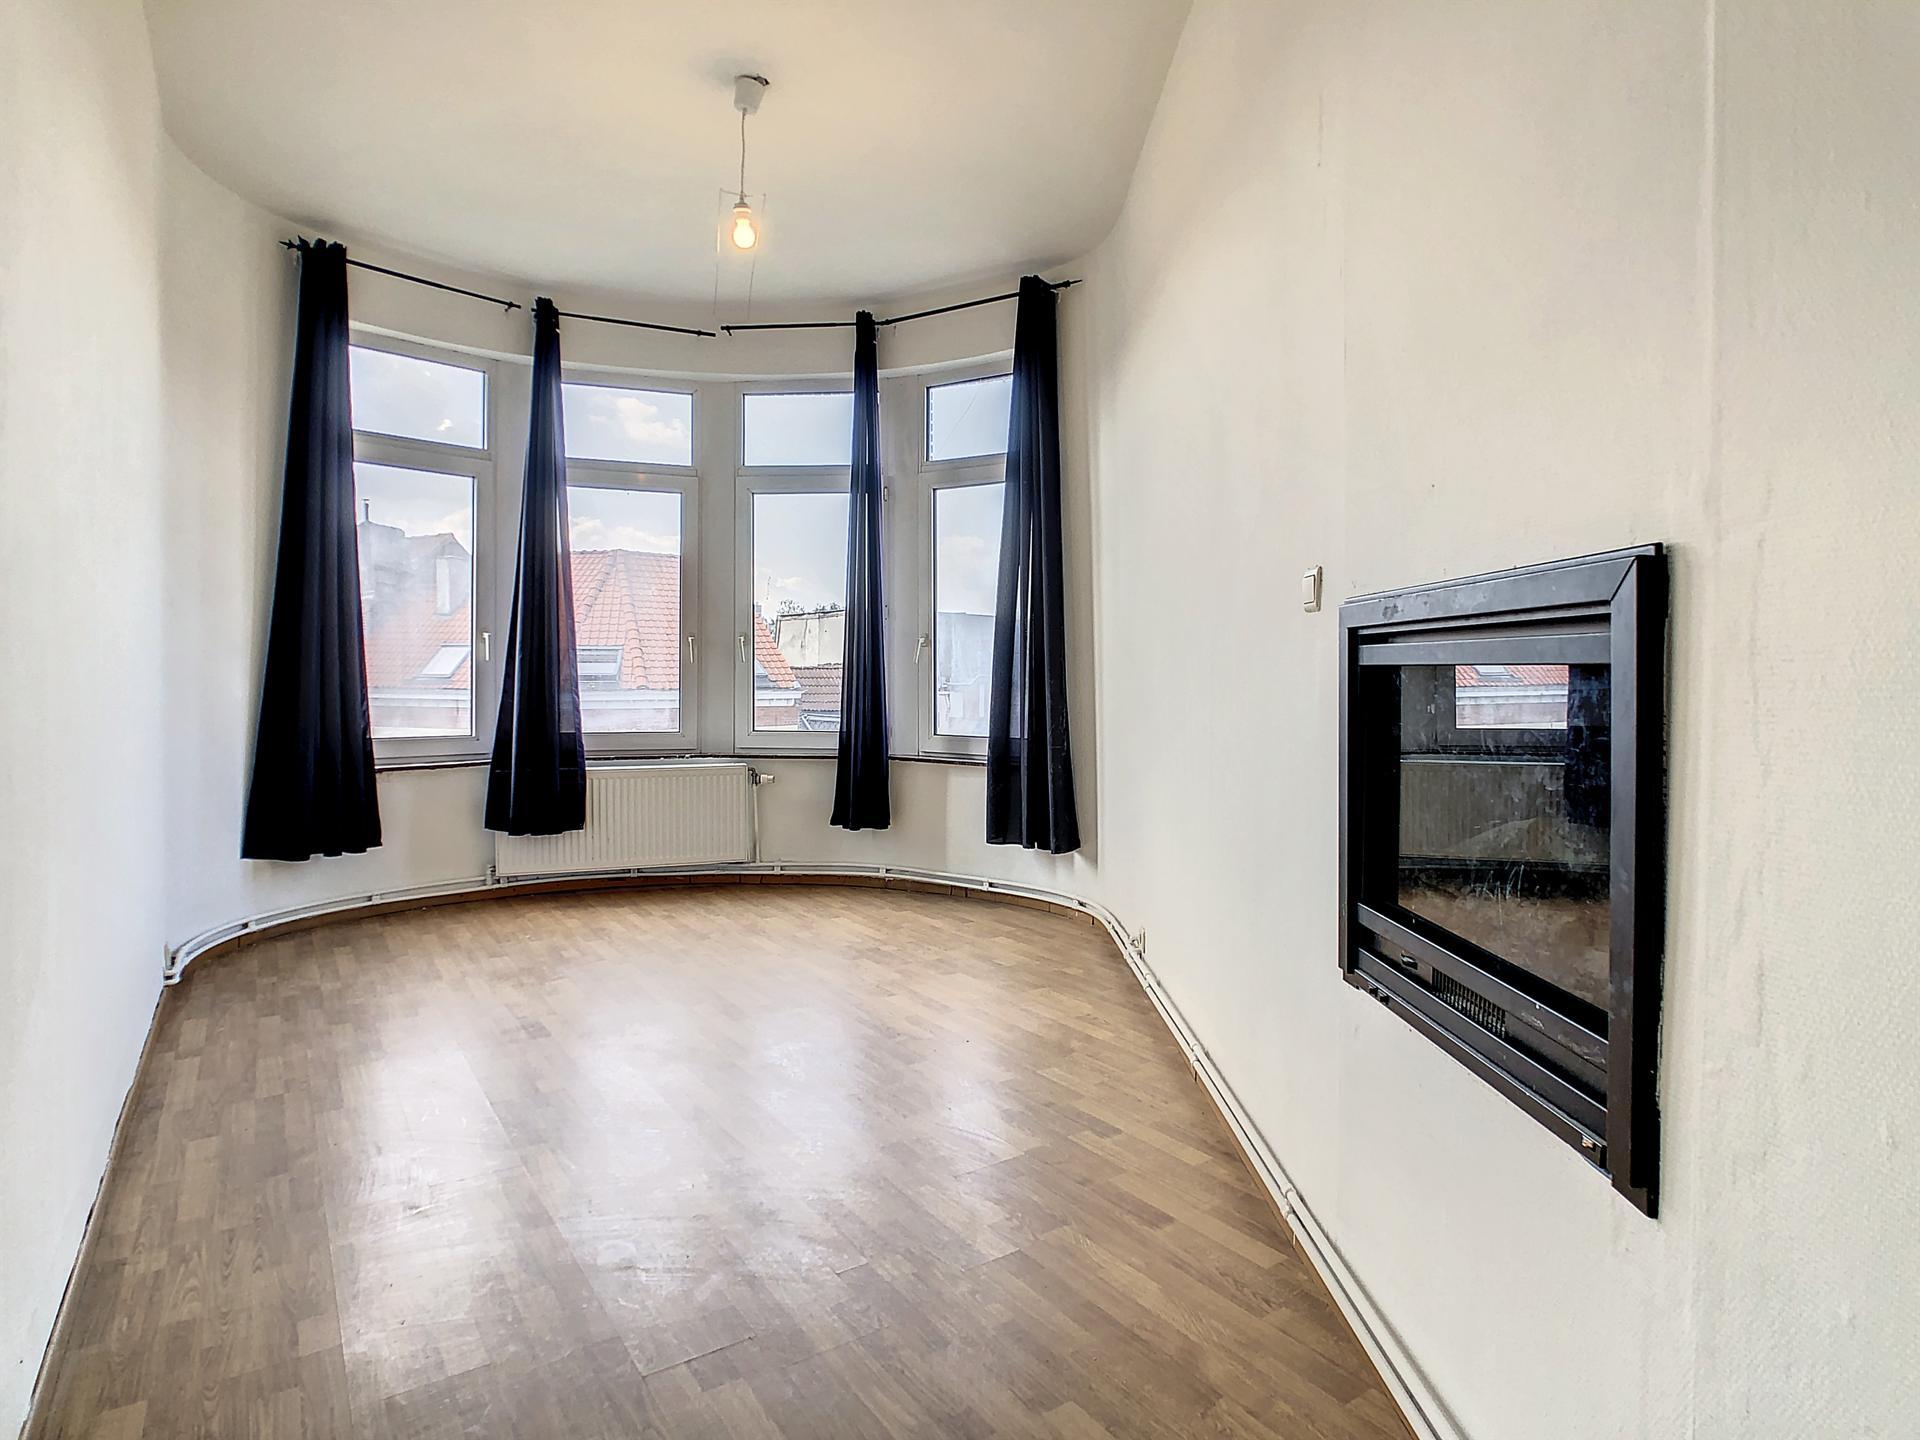 Appartement - Jette - #4509392-4